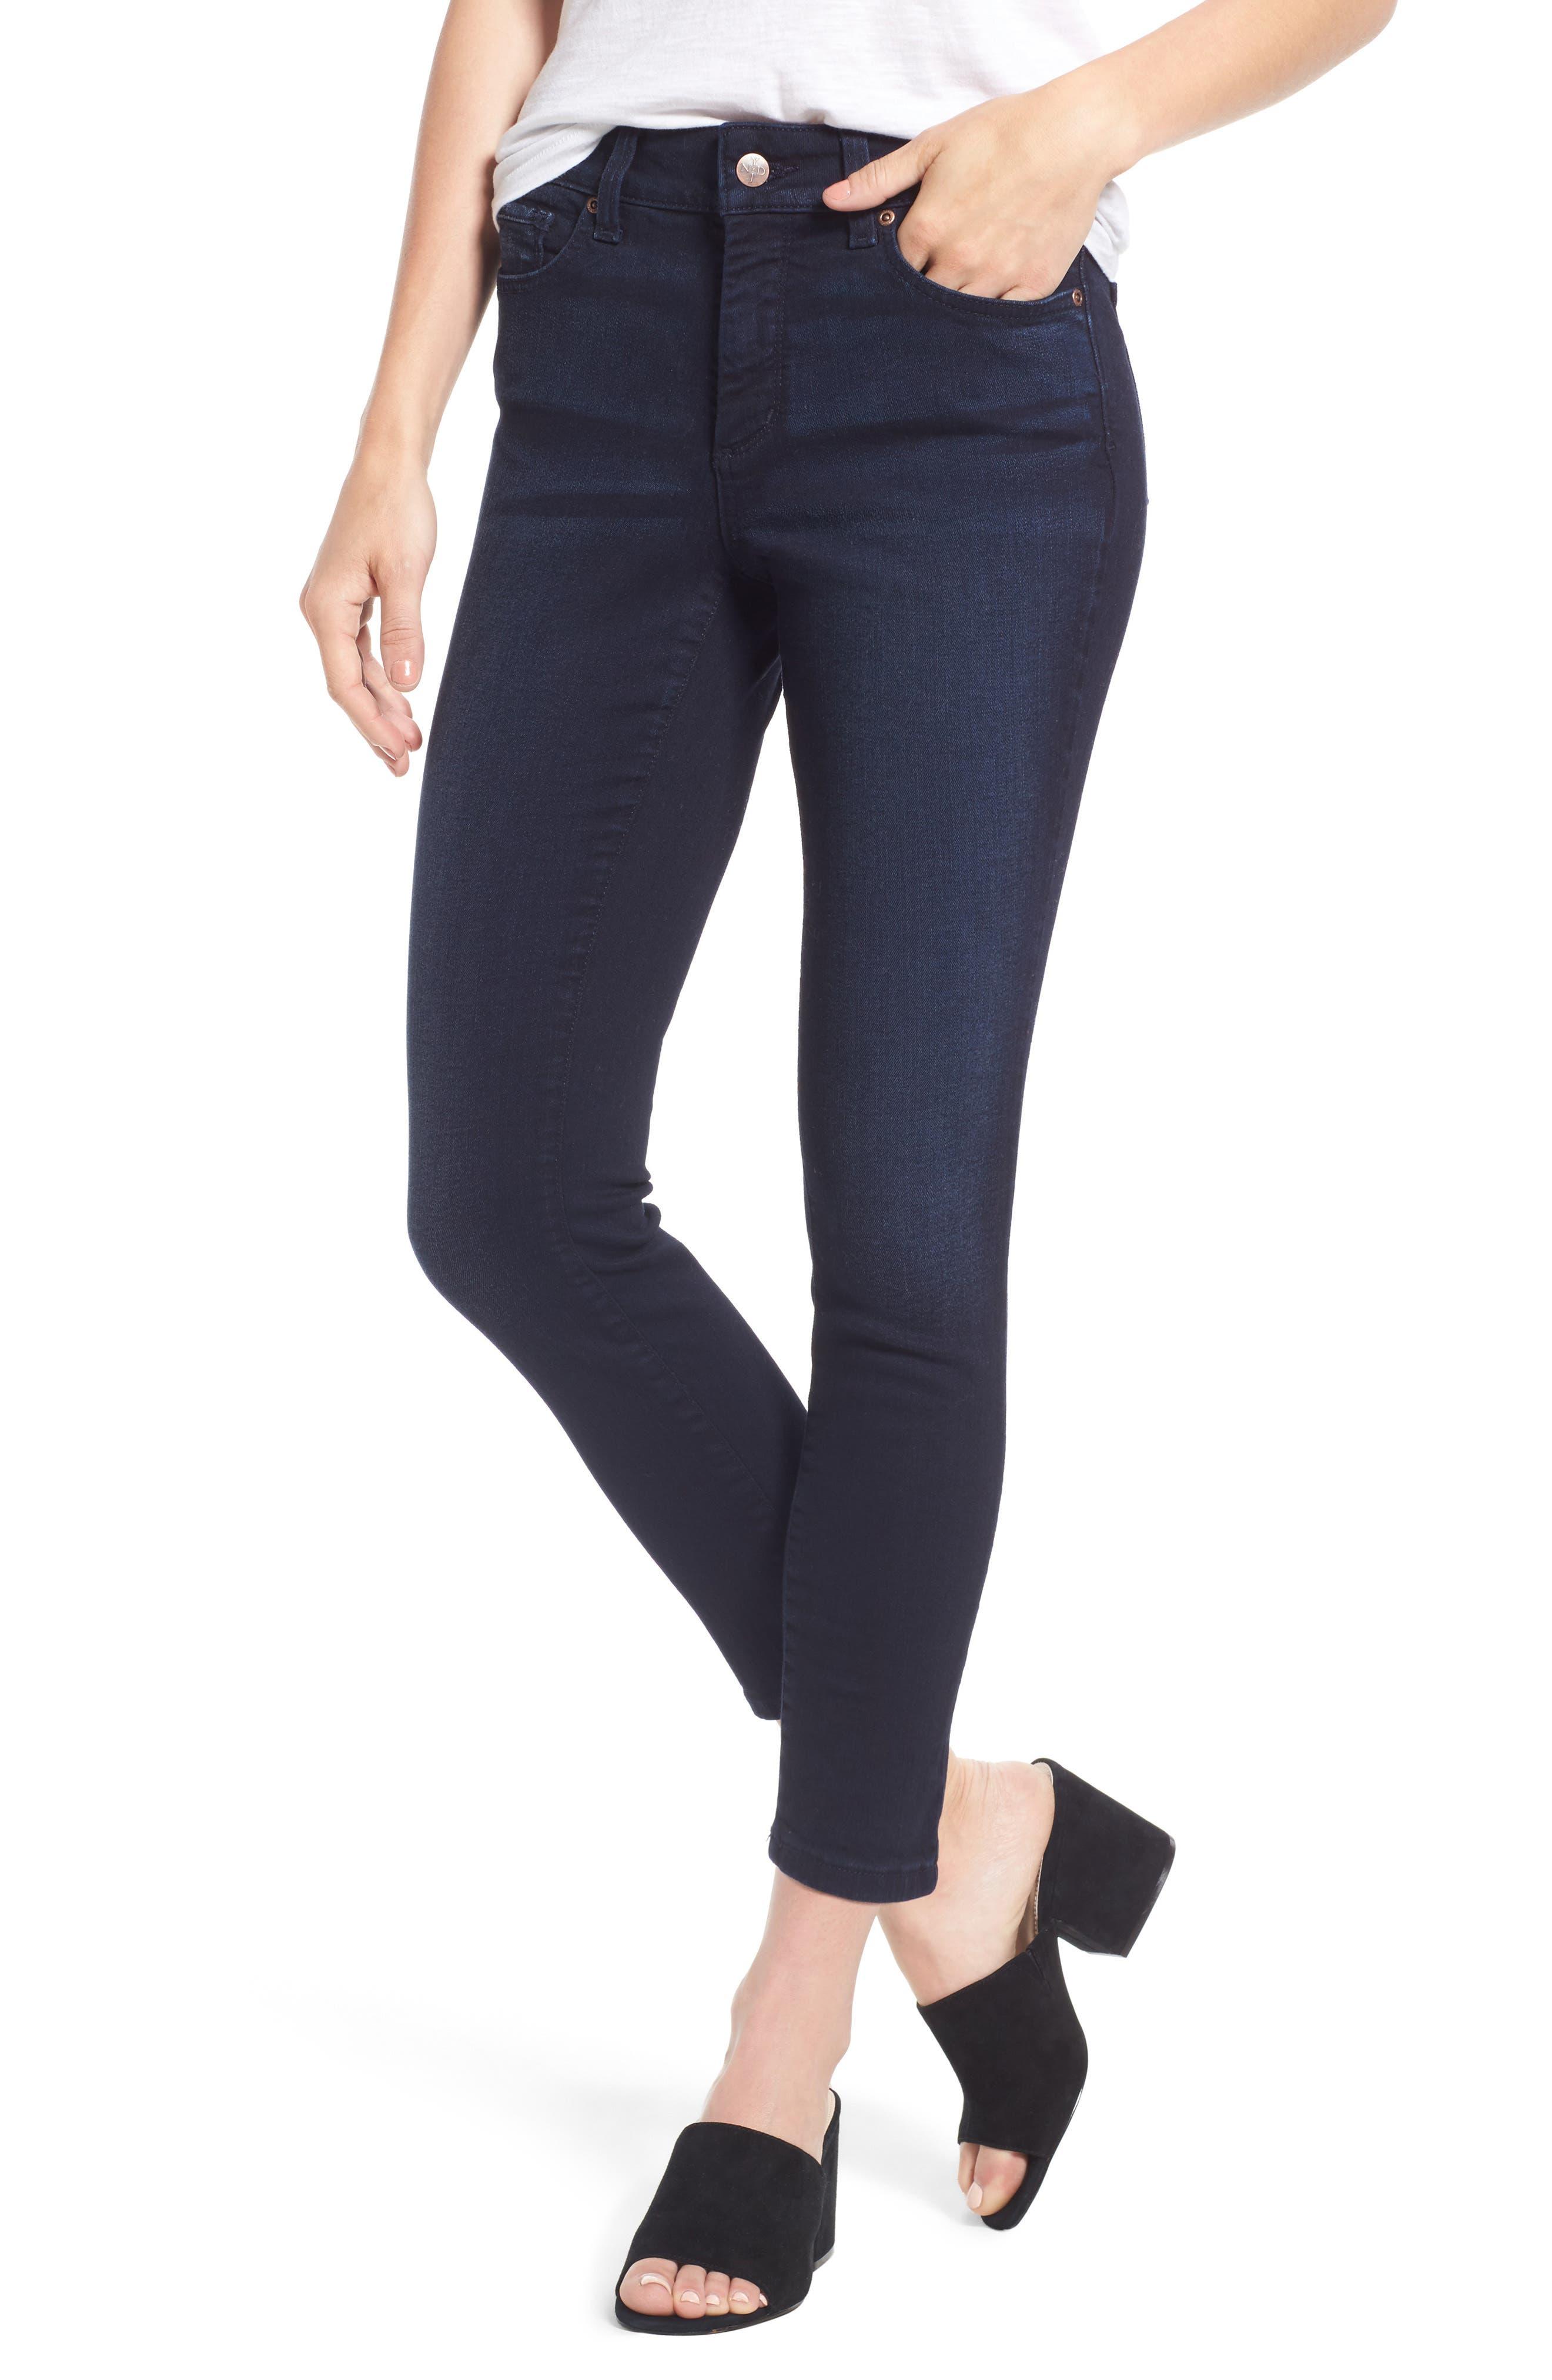 Main Image - NYDJ Ami Stretch Ankle Skinny Jeans (Sinclair) (Regular & Petite)